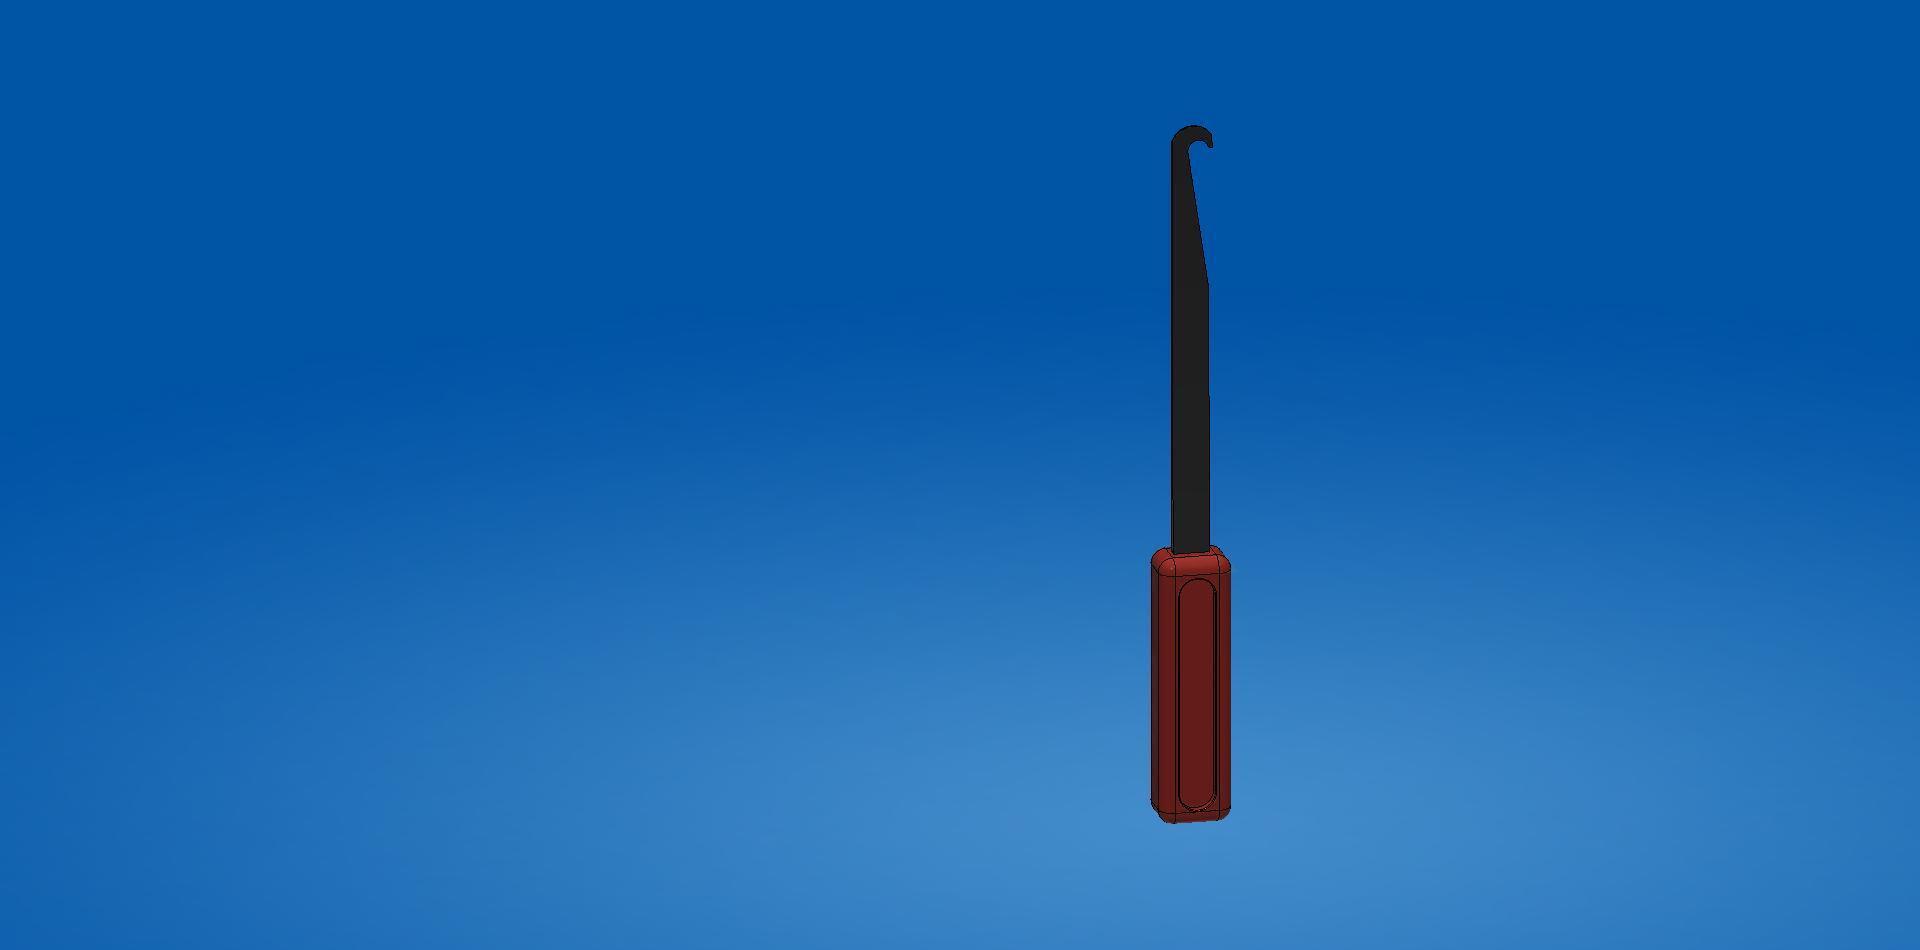 Chip Chaser v4.jpg Download free STL file Chip Chaser • 3D printable object, jasonwarsalla